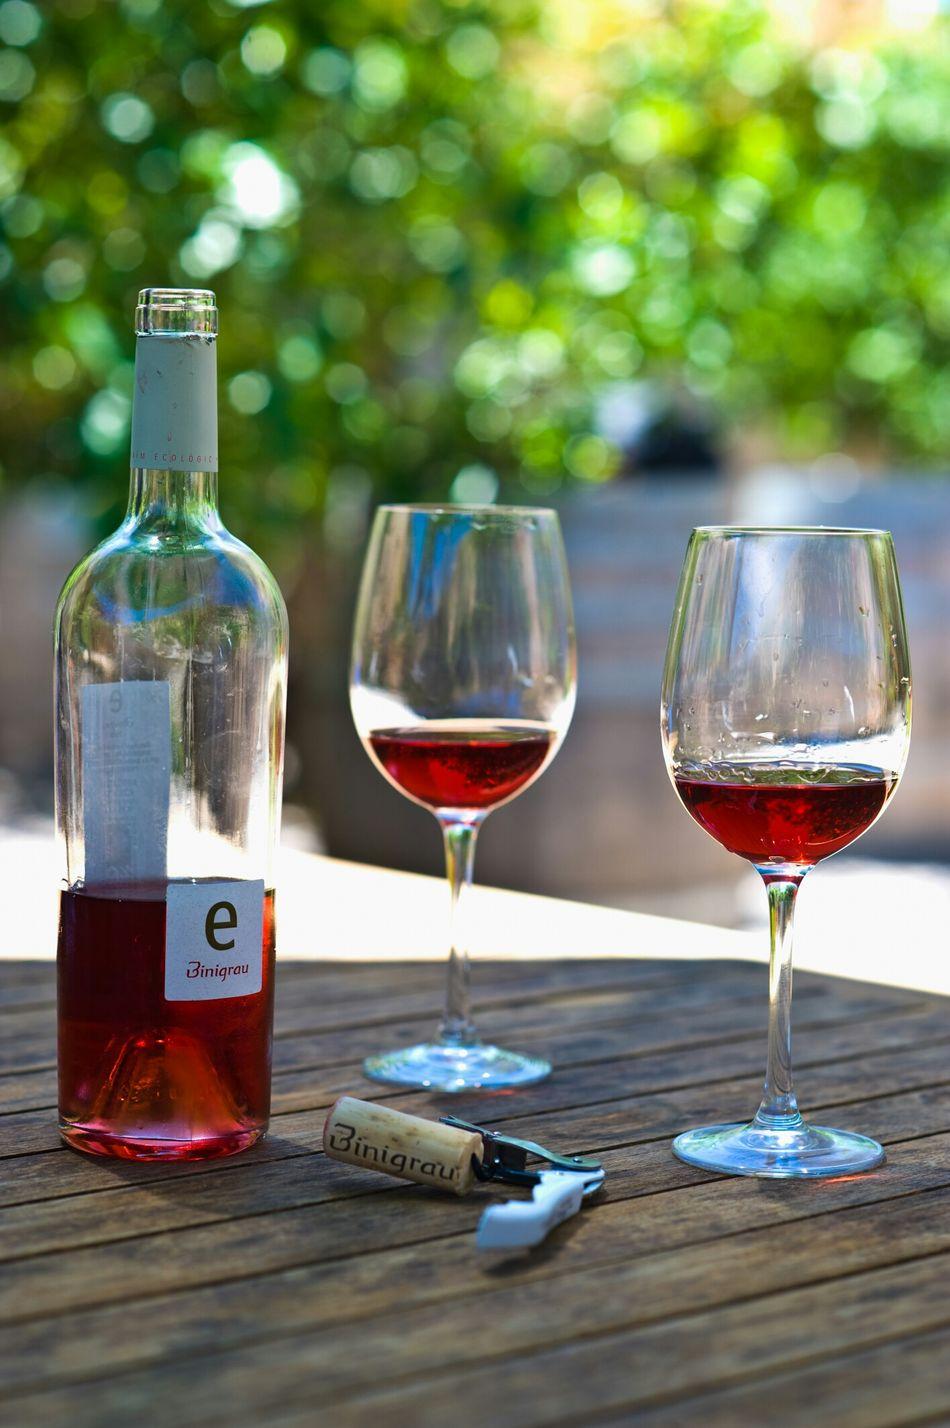 Wine Tasting Wine Binigrau Mallorca Spanish Food SPAIN Wine Moments